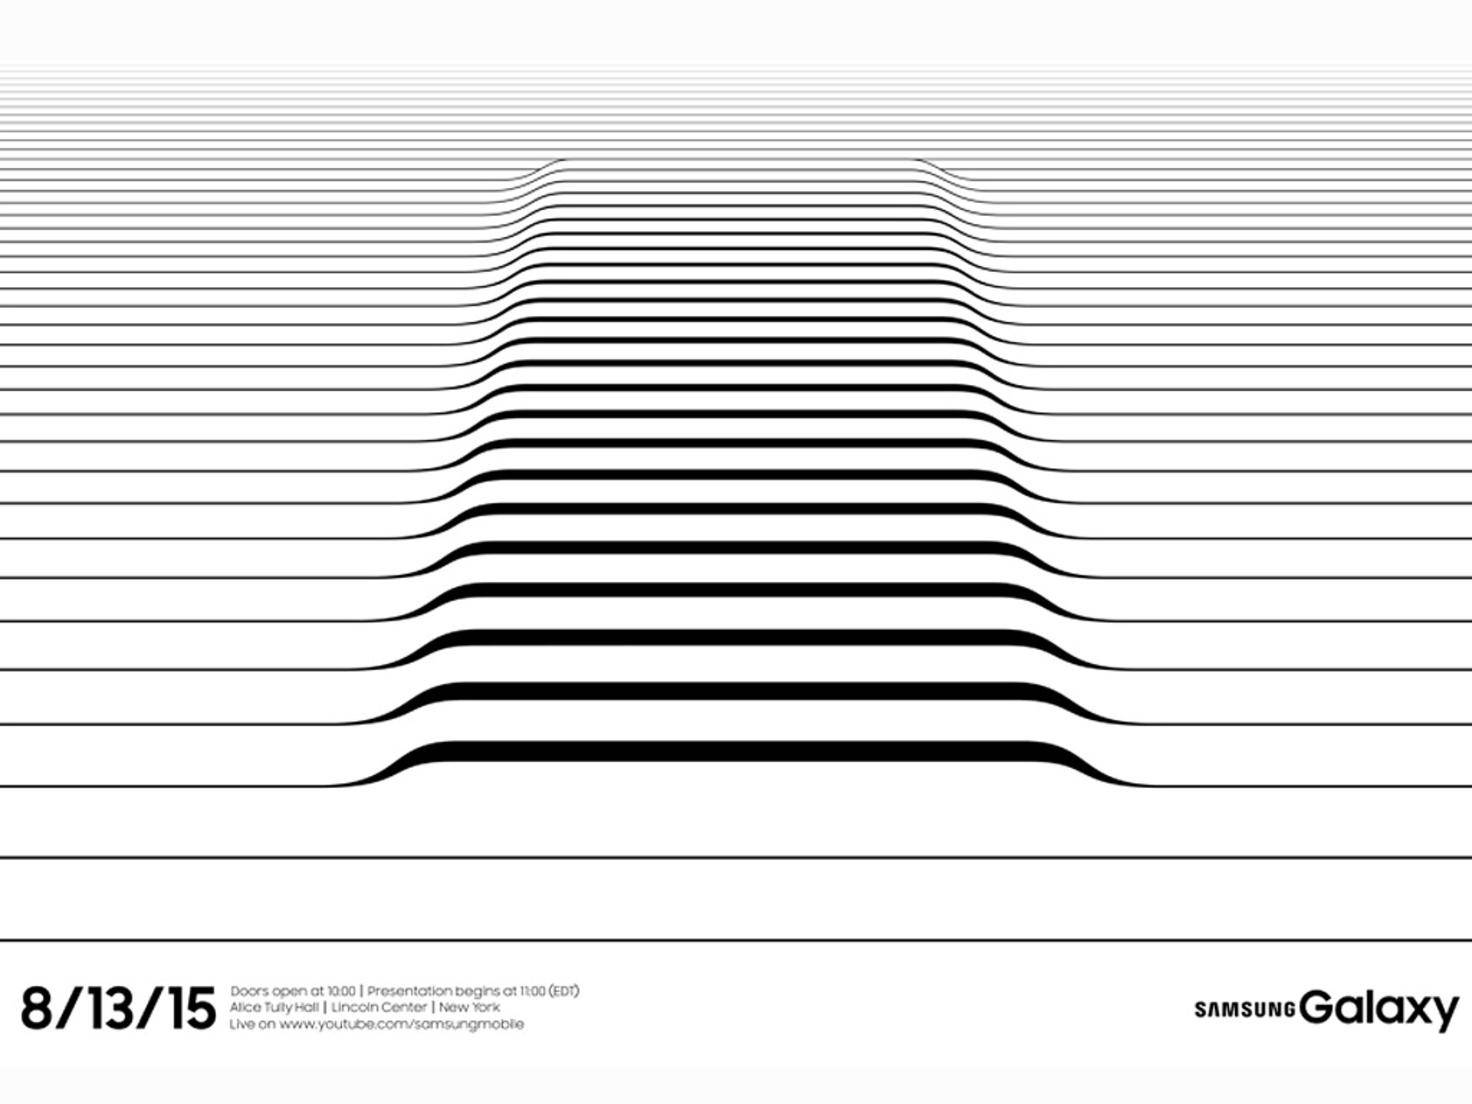 Samsung Galaxy Unpacked-Event